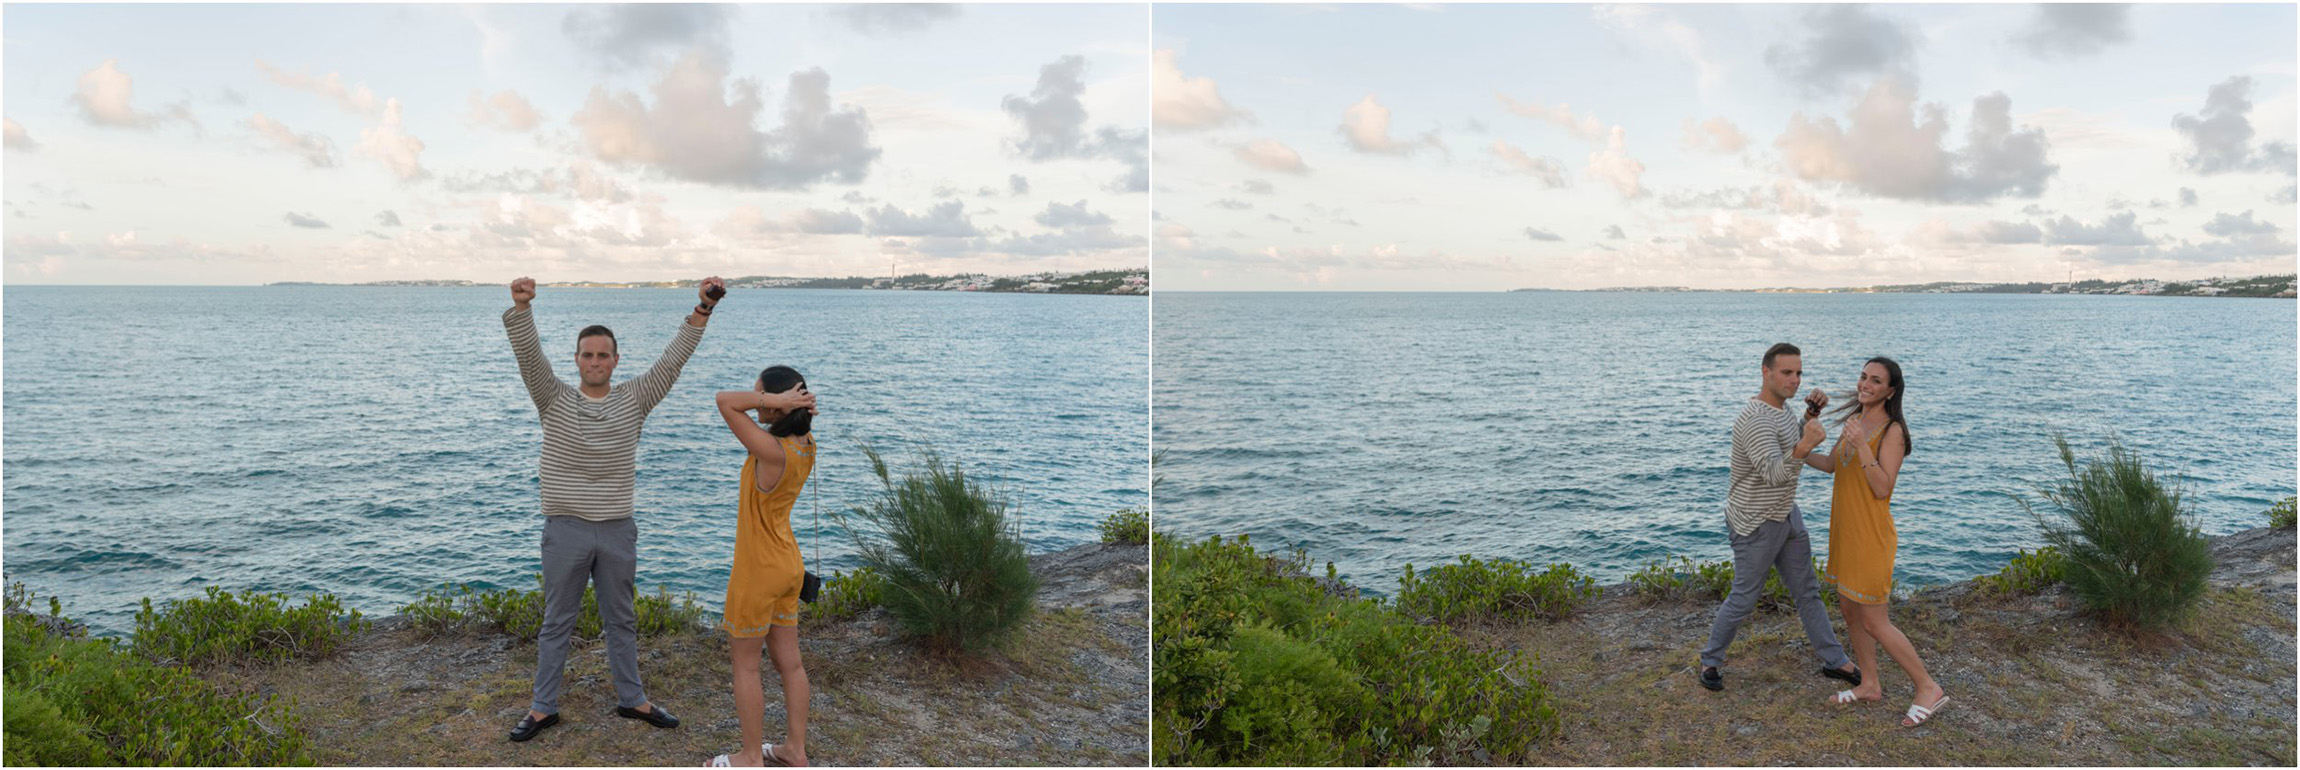 ©FianderFoto_Proposal Photographer_Bermuda_Admiralty House_Kresnick_Rina_005.jpg